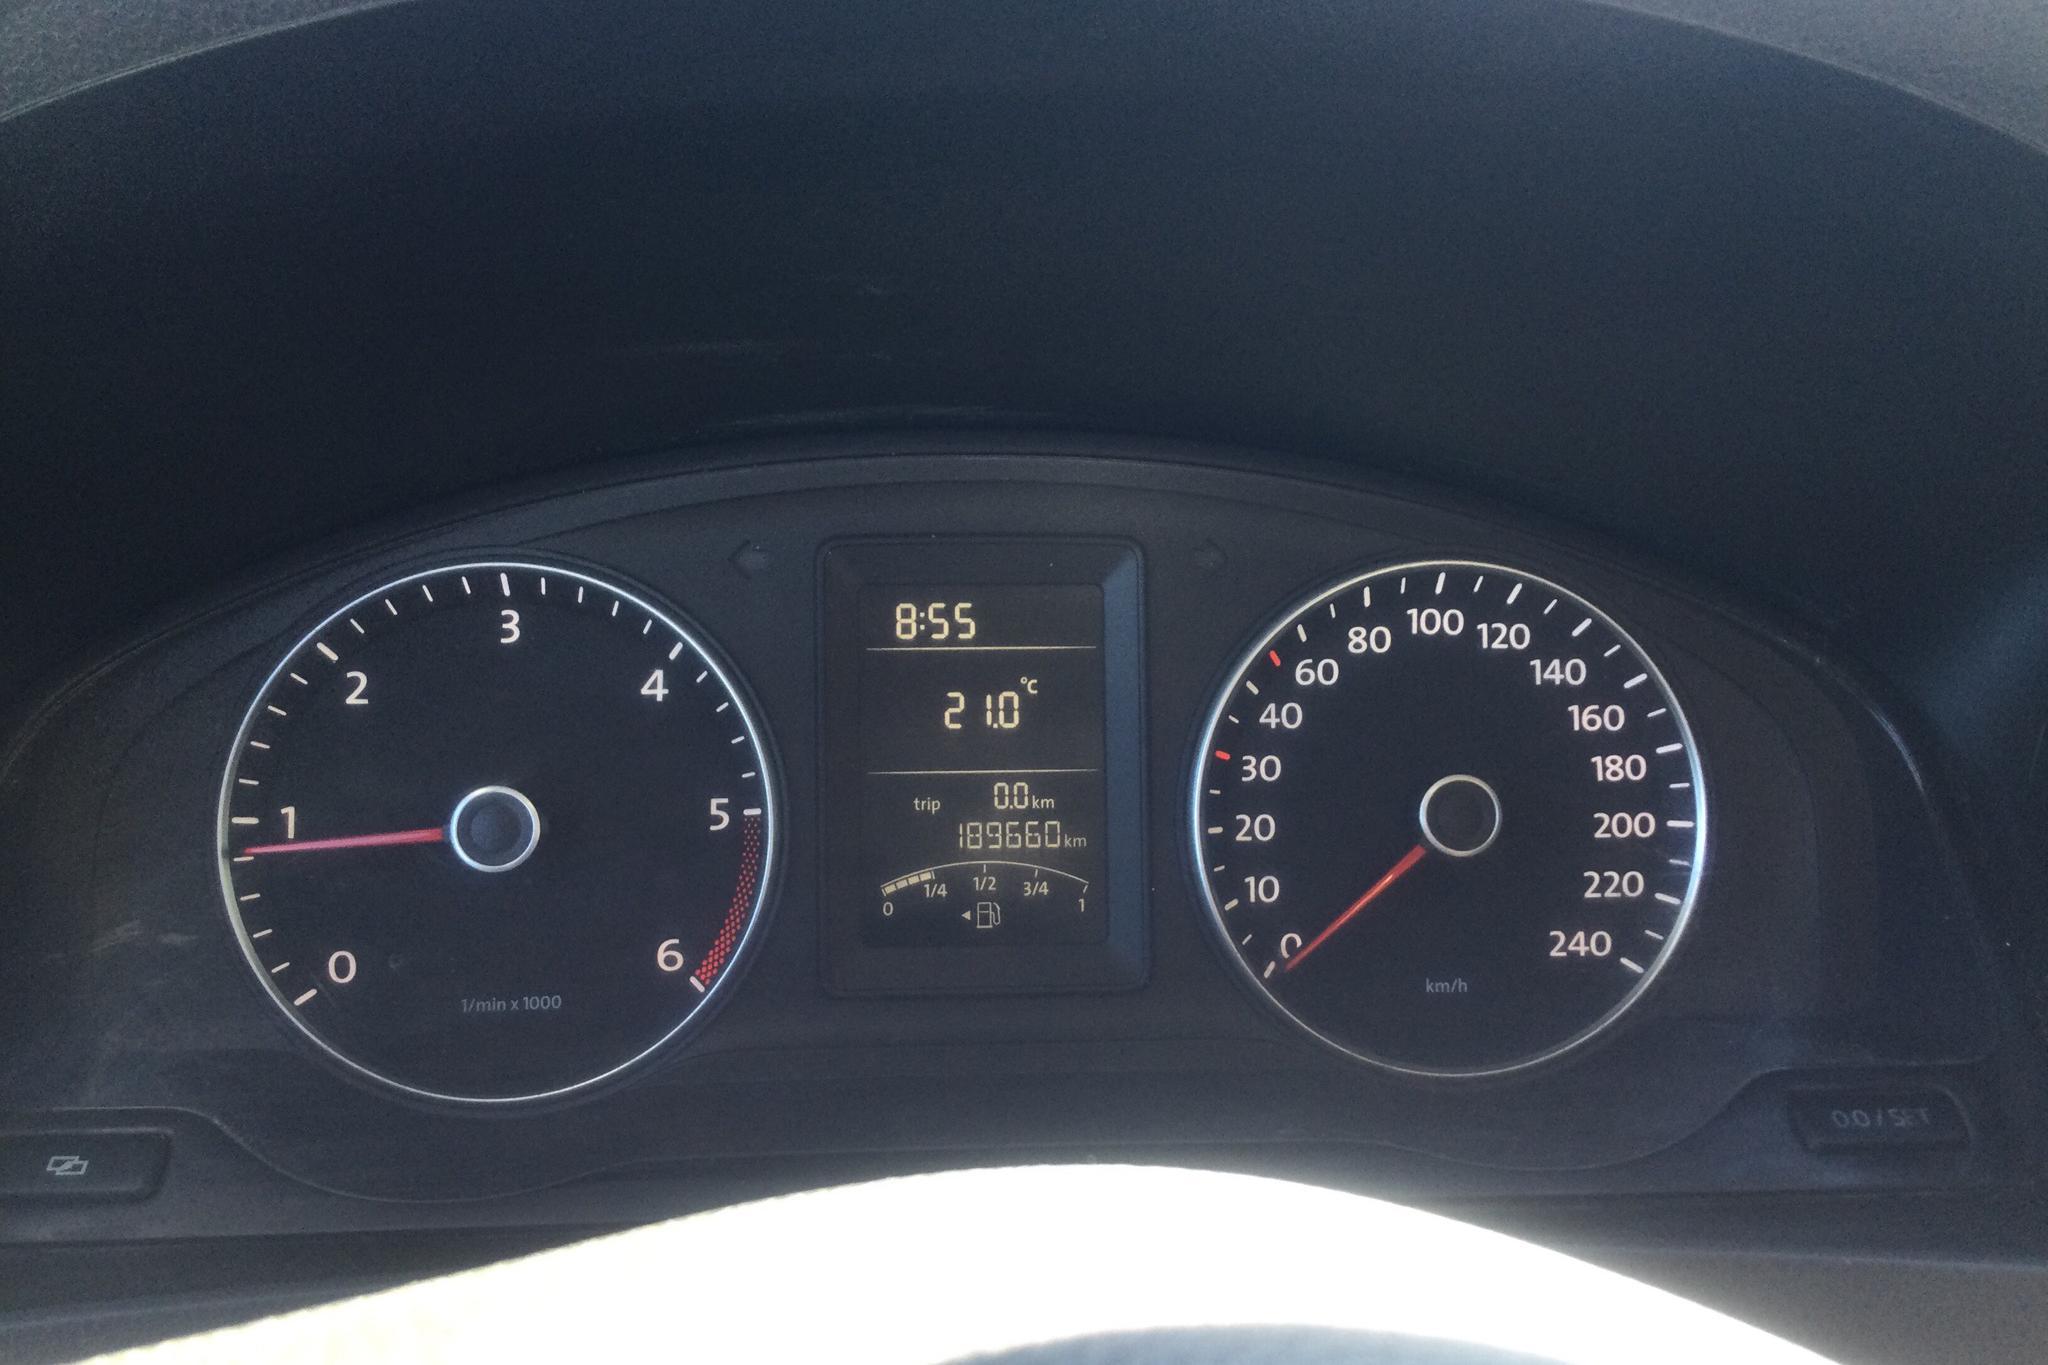 VW Transporter T5 2.0 TDI (102hk) - 18 966 mil - Manuell - silver - 2011